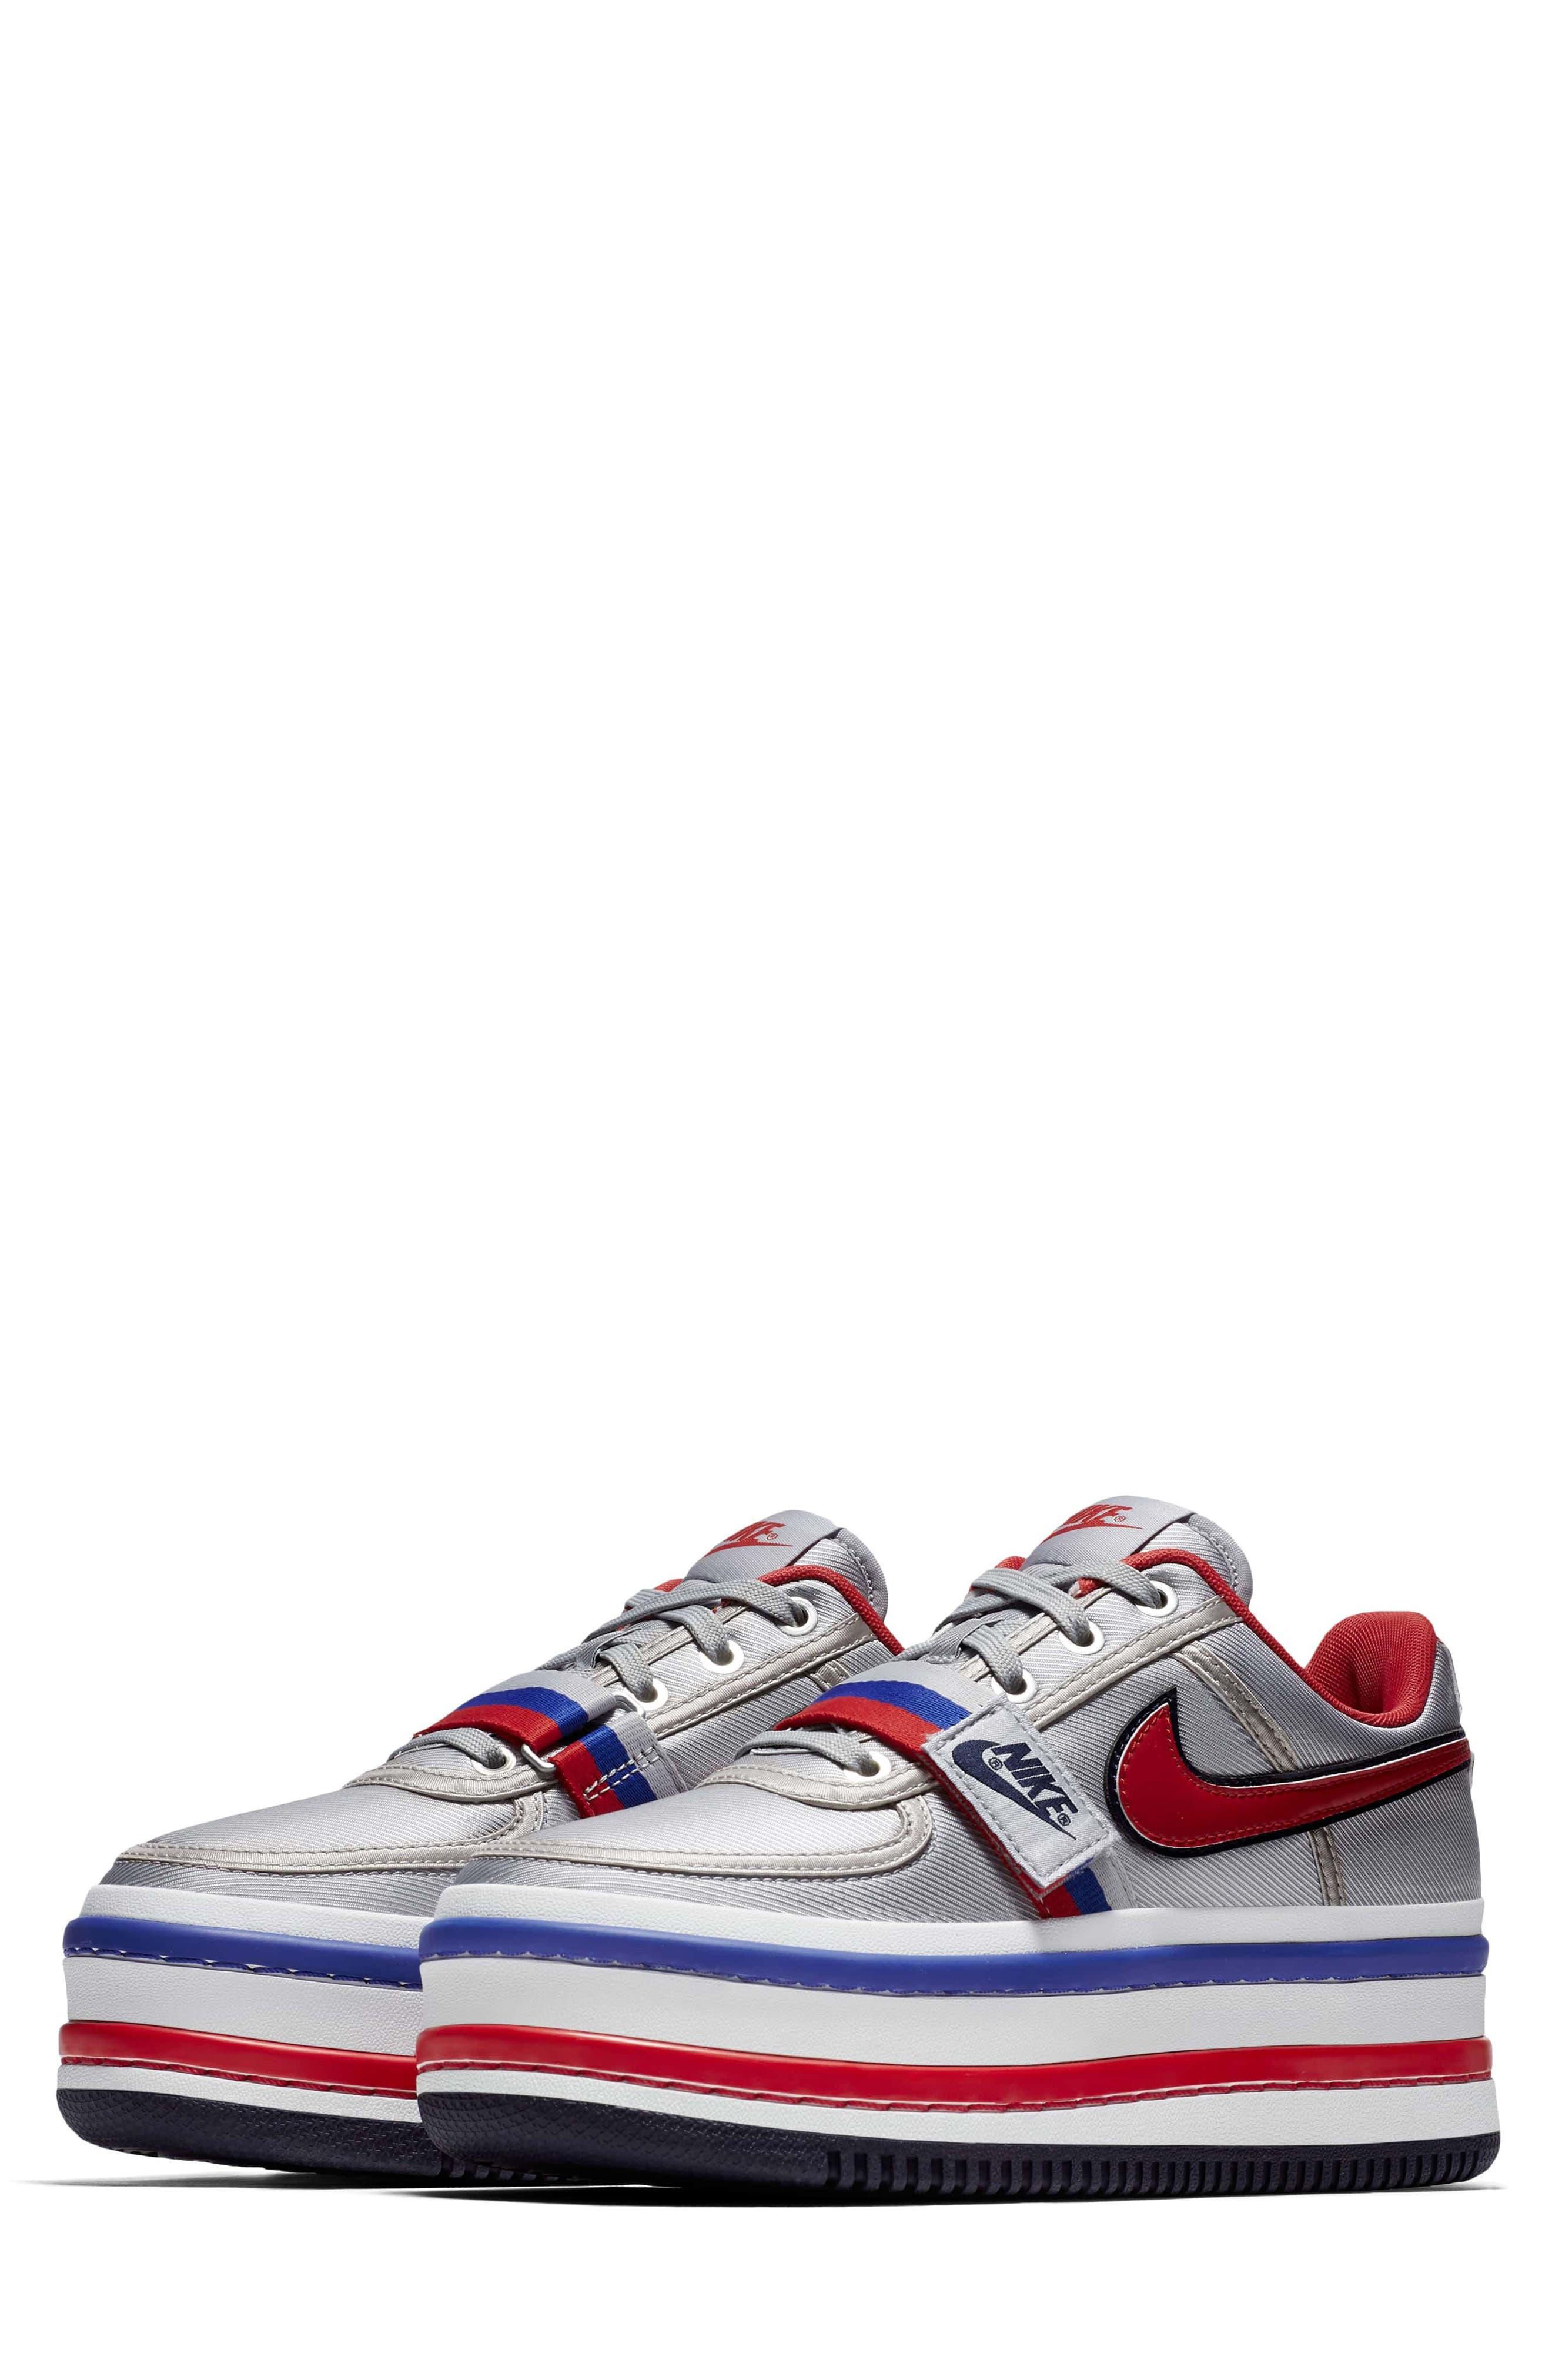 Vandal 2K Sneaker,                             Main thumbnail 1, color,                             SILVER/ UNIVERSITY RED